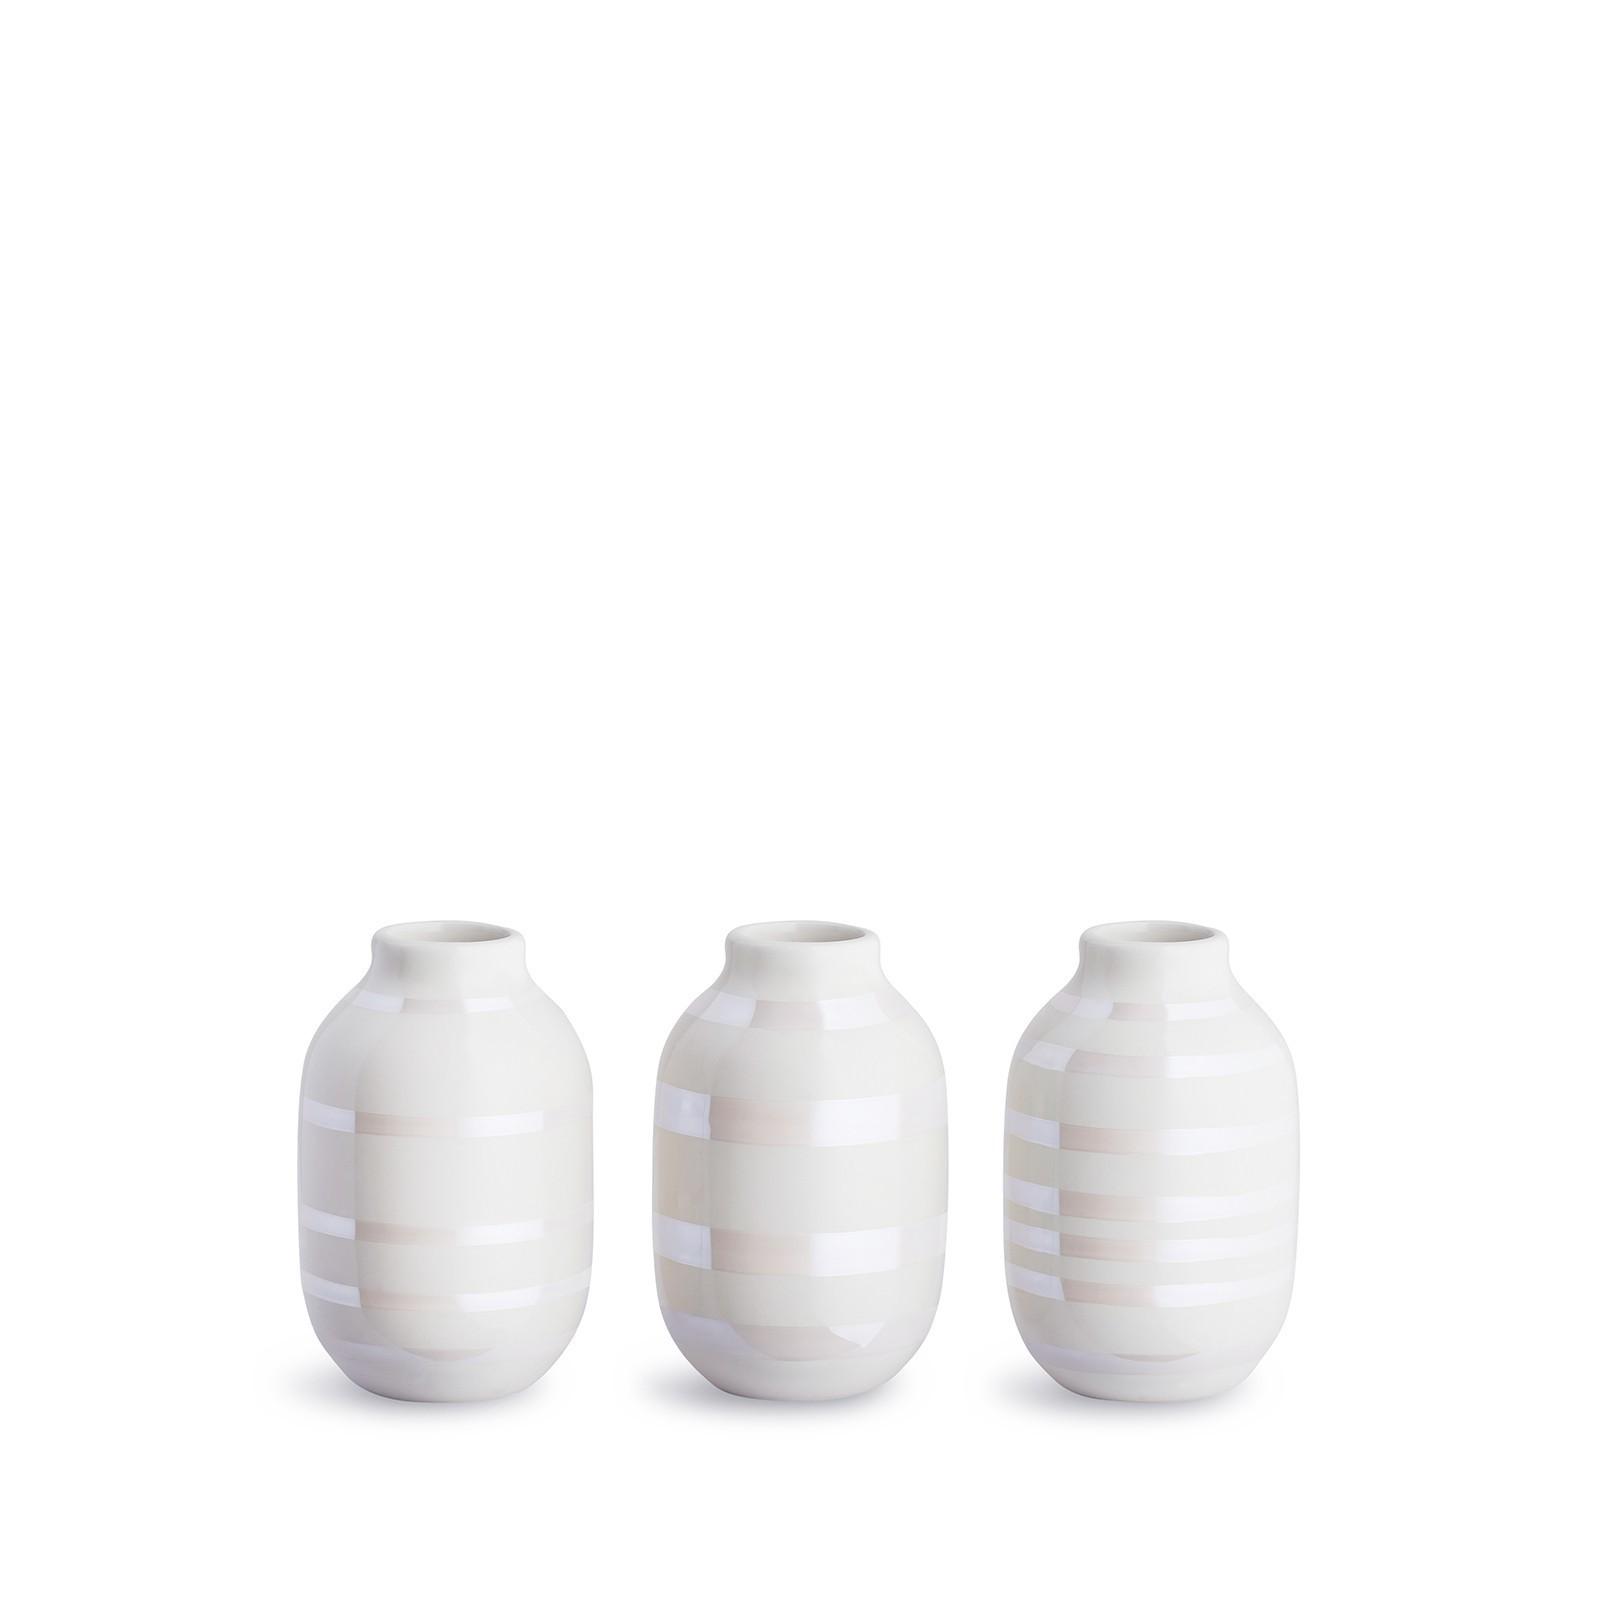 Kähler Omaggio Vasen Miniature 3er Set